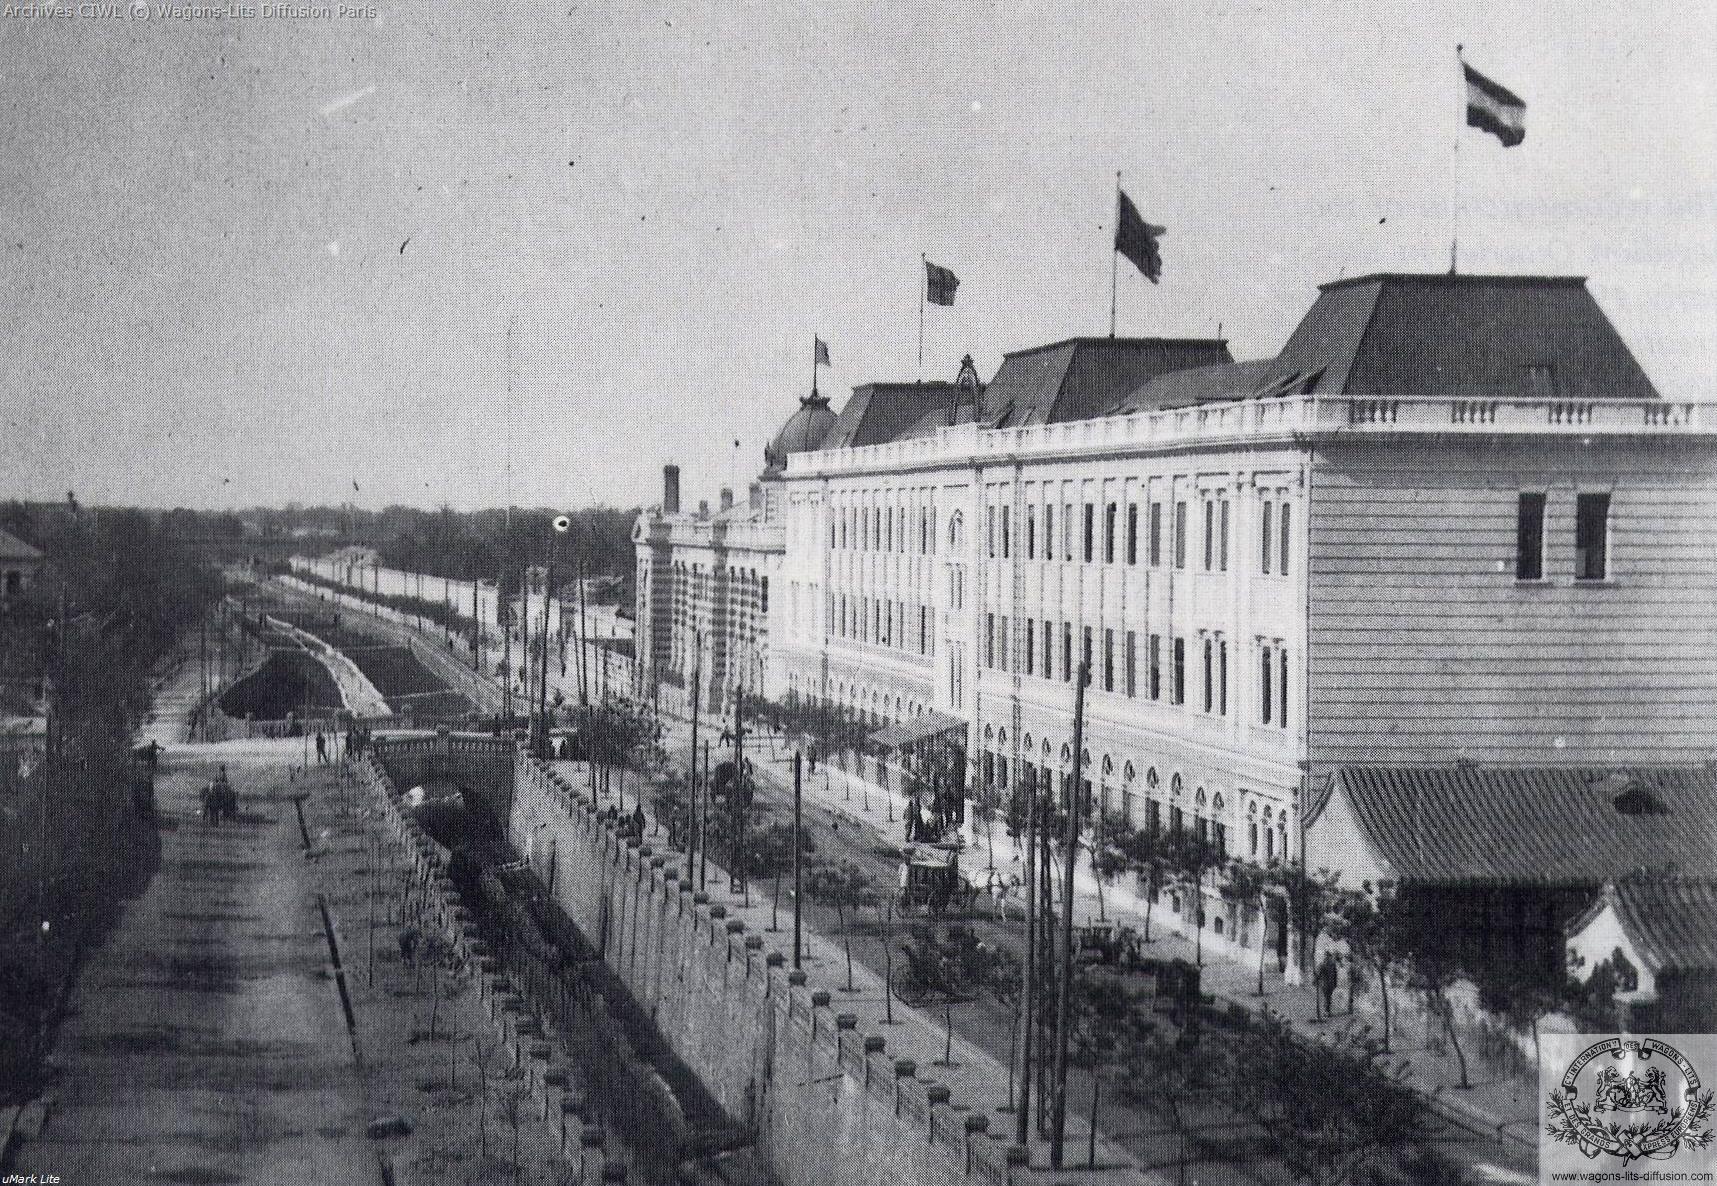 Wl the grand hotel of peking 1